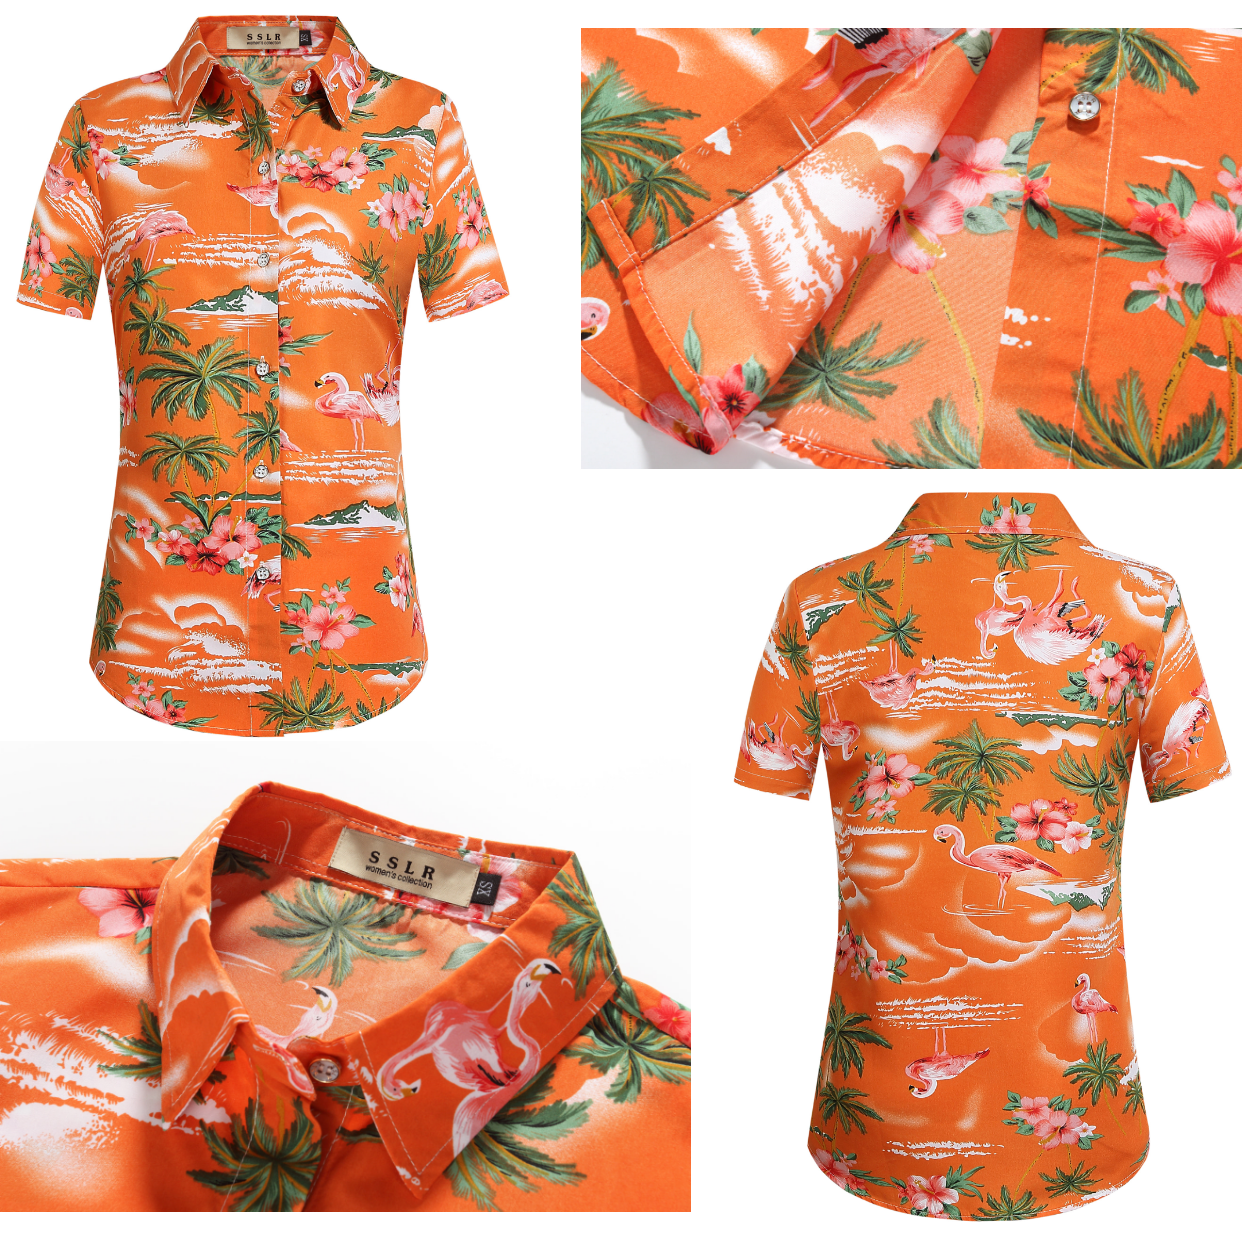 99c3aac5d Women's Orange Hawaiian Shirt with Flamingos #flamingo shirts #hawaiian  shirts #tropical floral shirts